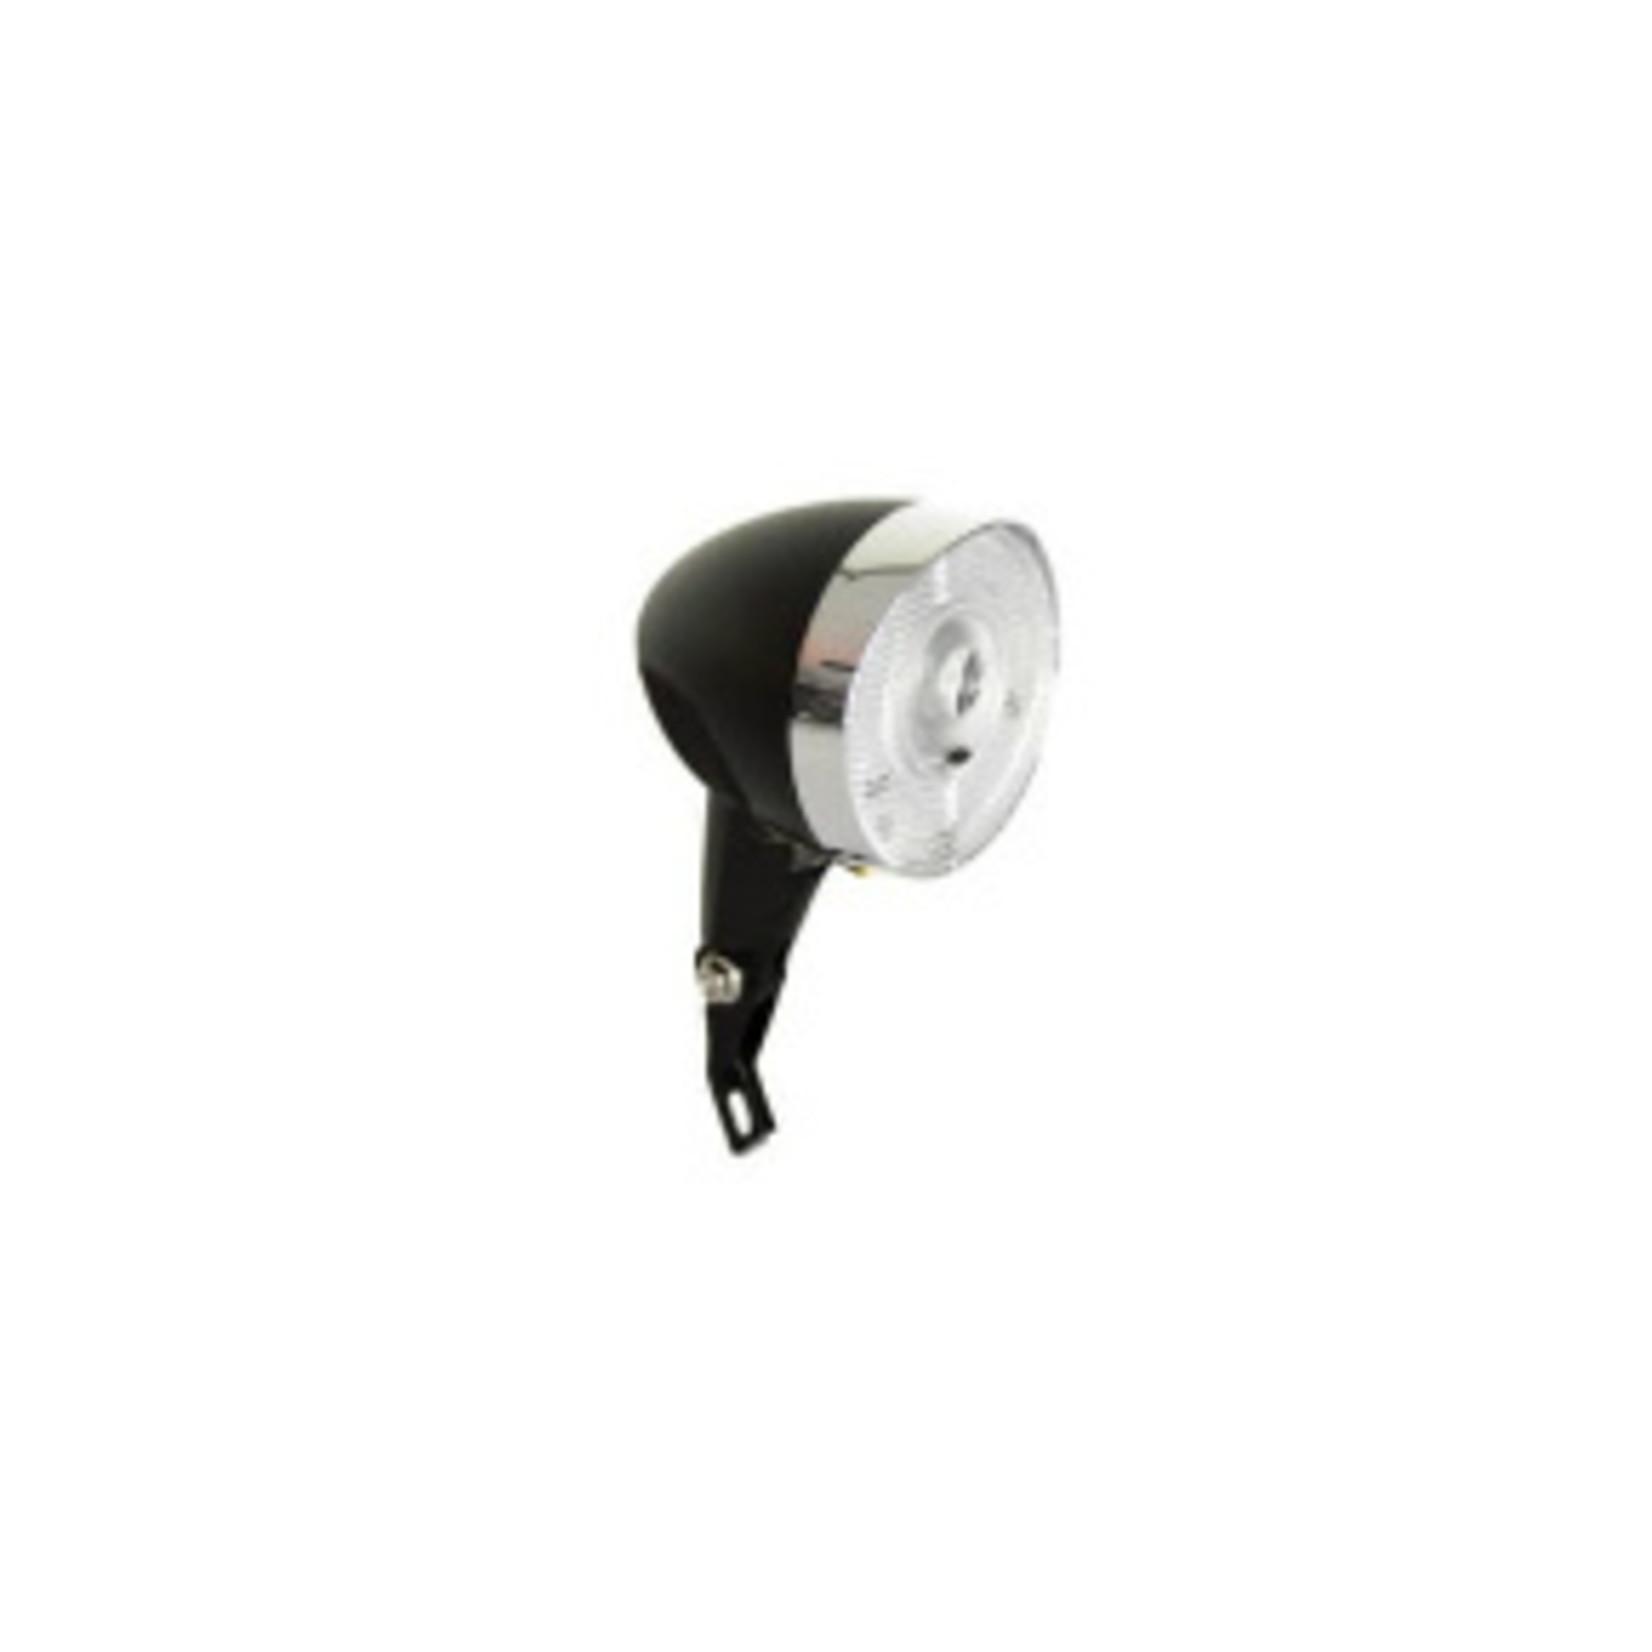 LED head light Automatic